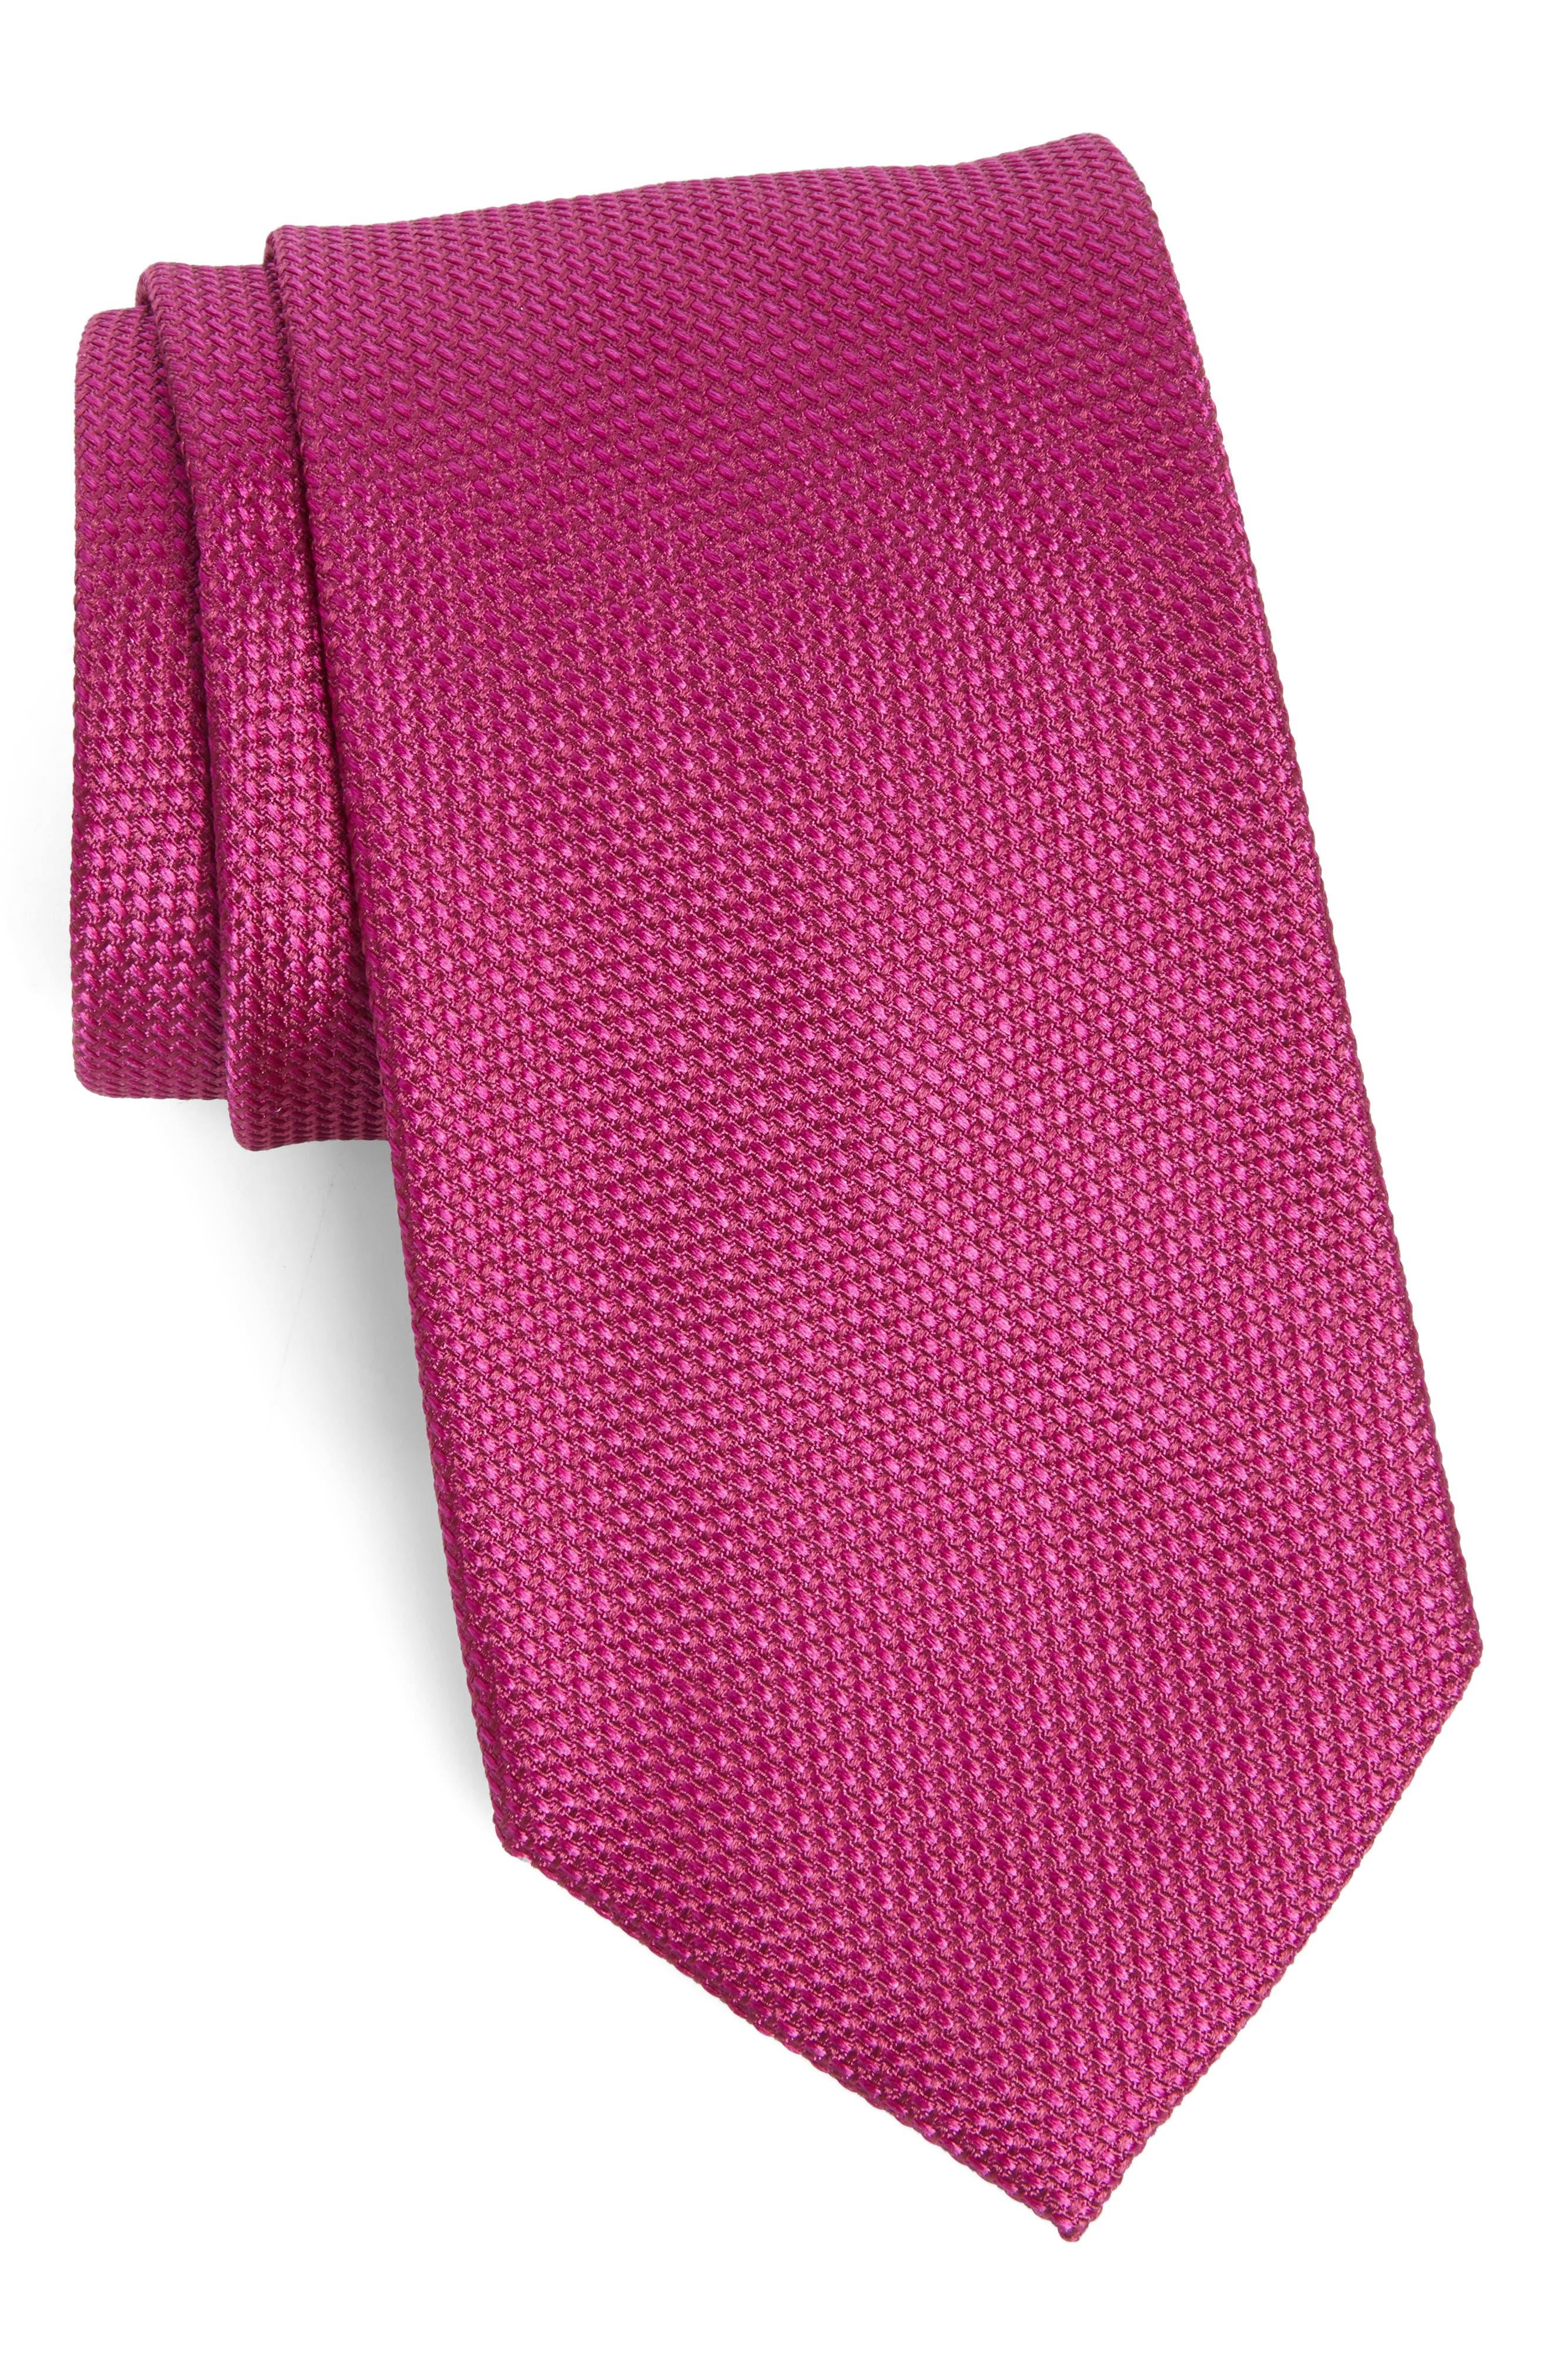 Main Image - Nordstrom Men's Shop Solid Silk Tie (X-Long)